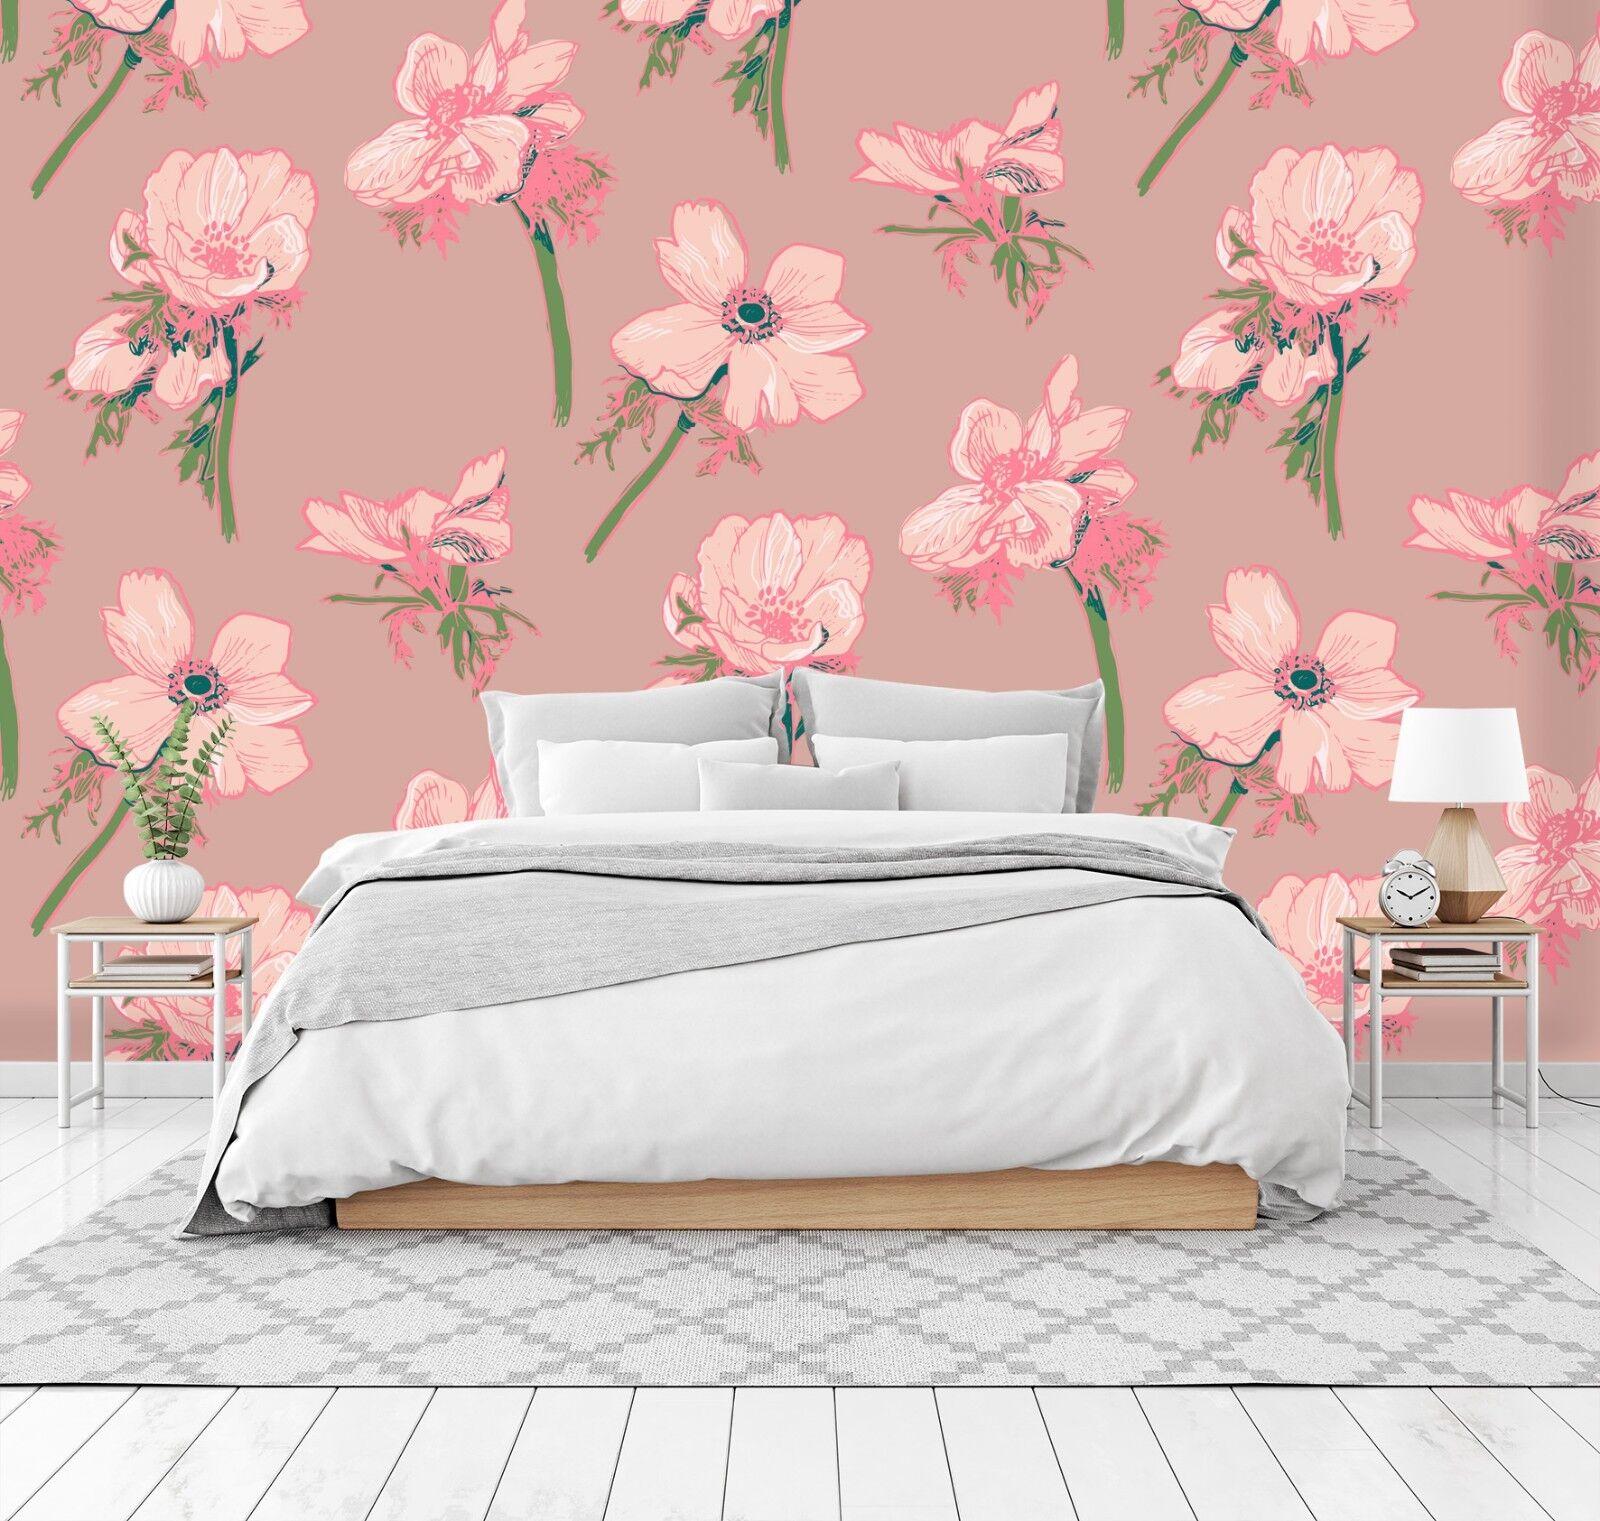 3D Bloom Petal 26 WallPaper Murals Wall Decal WallPaper AU Summer